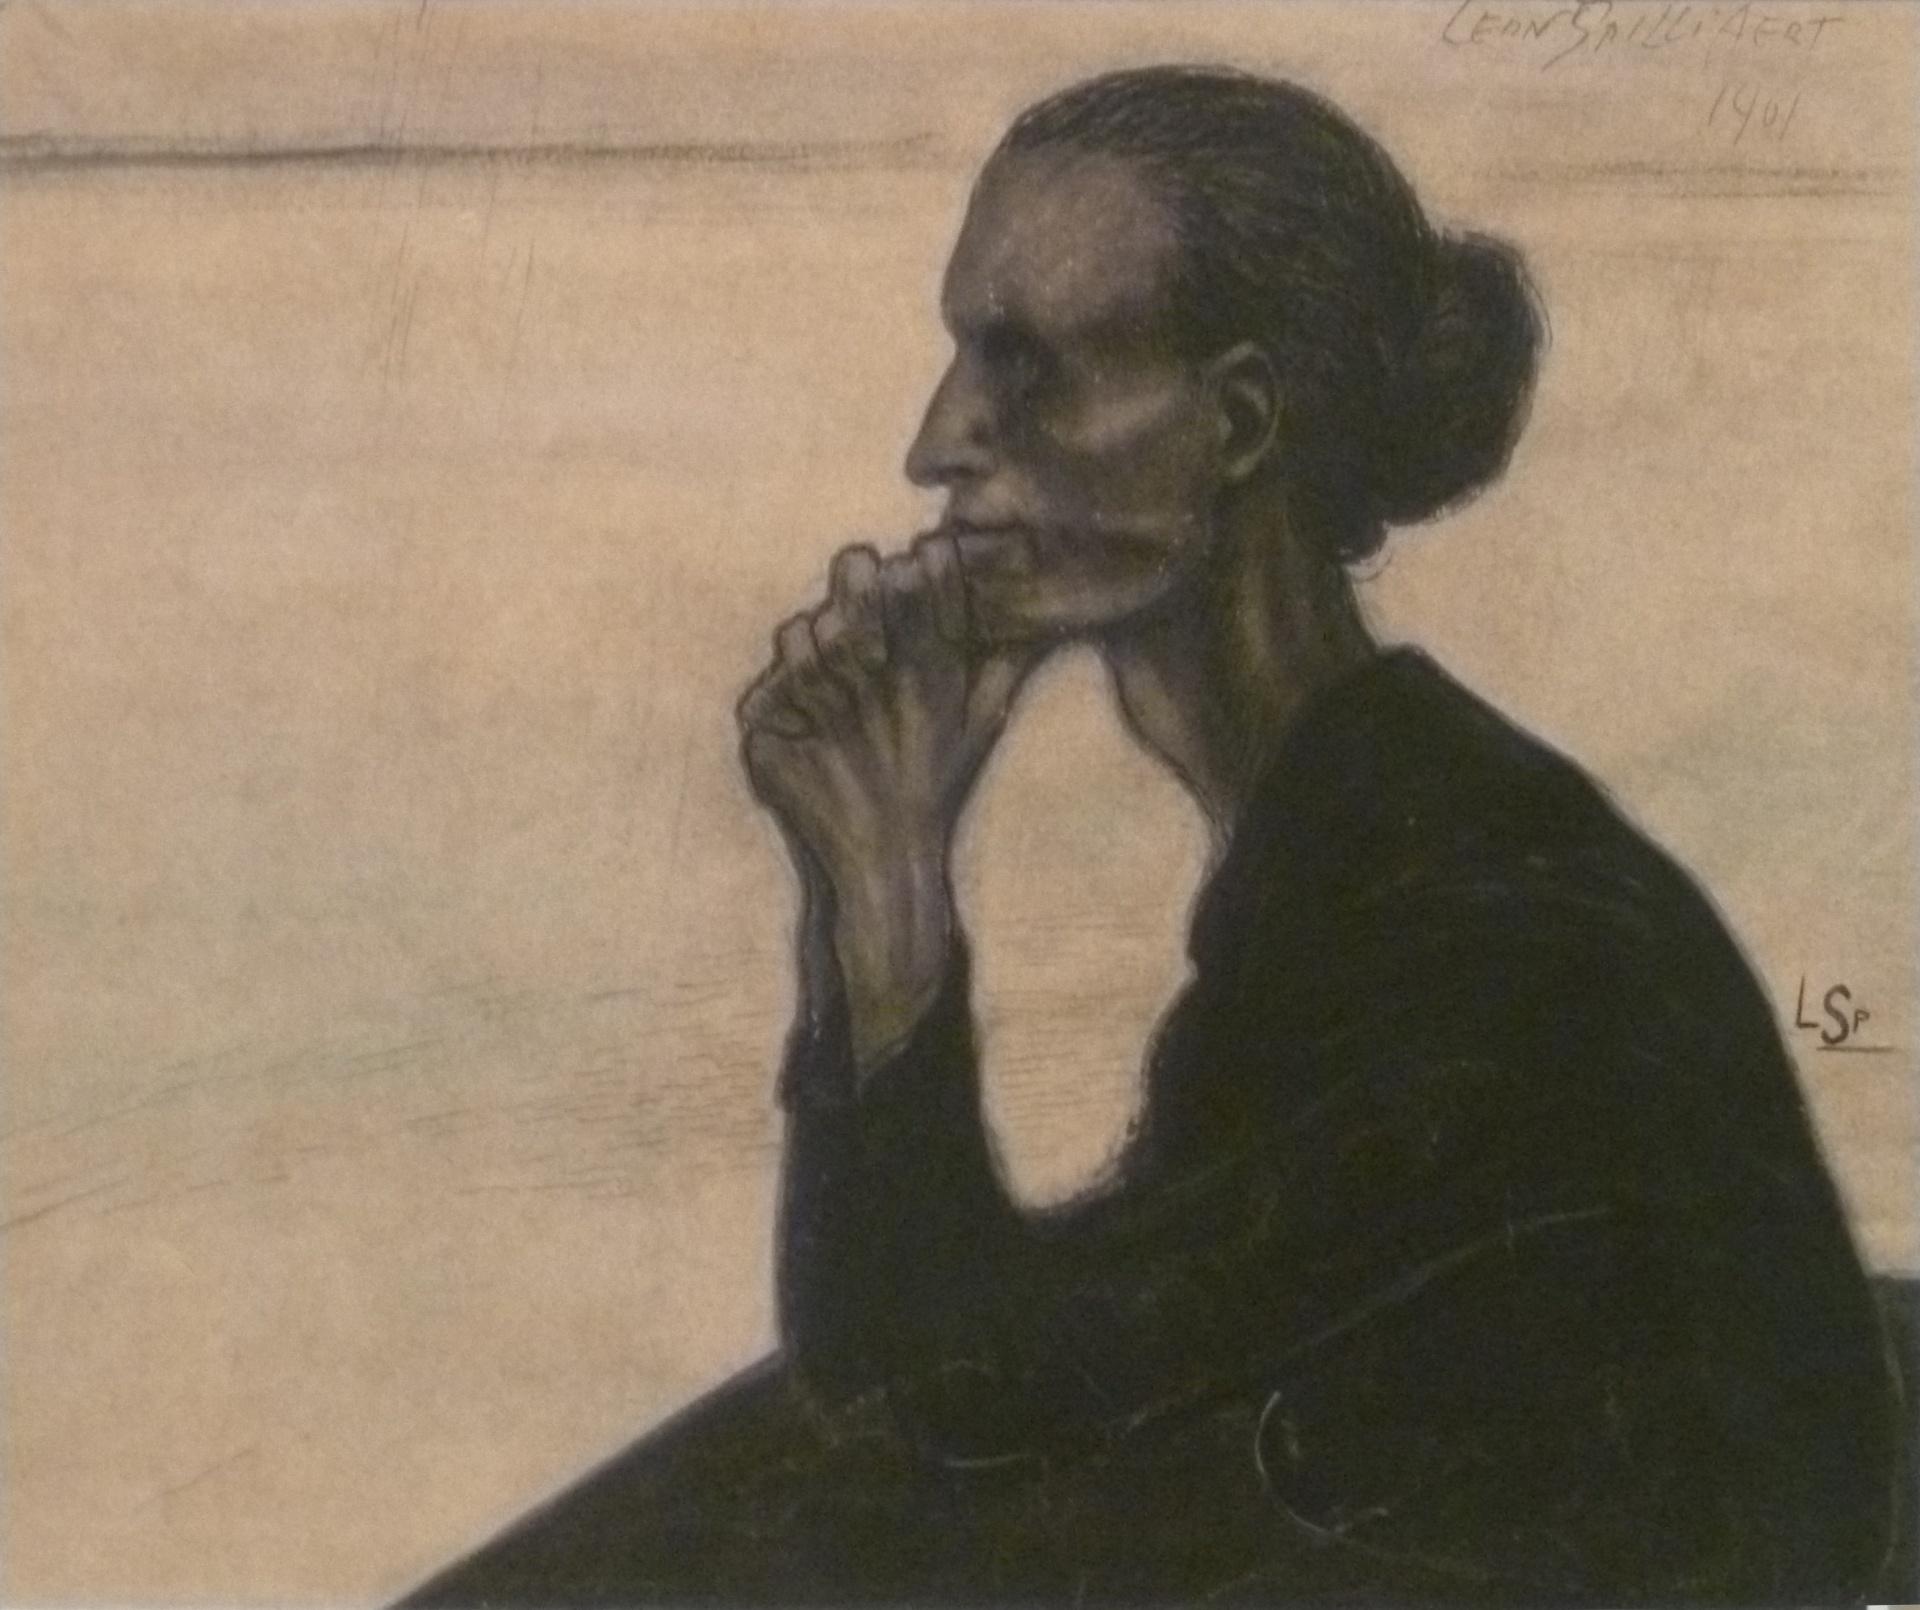 Léon Spilliaert, Pensive fisherwoman, 1901